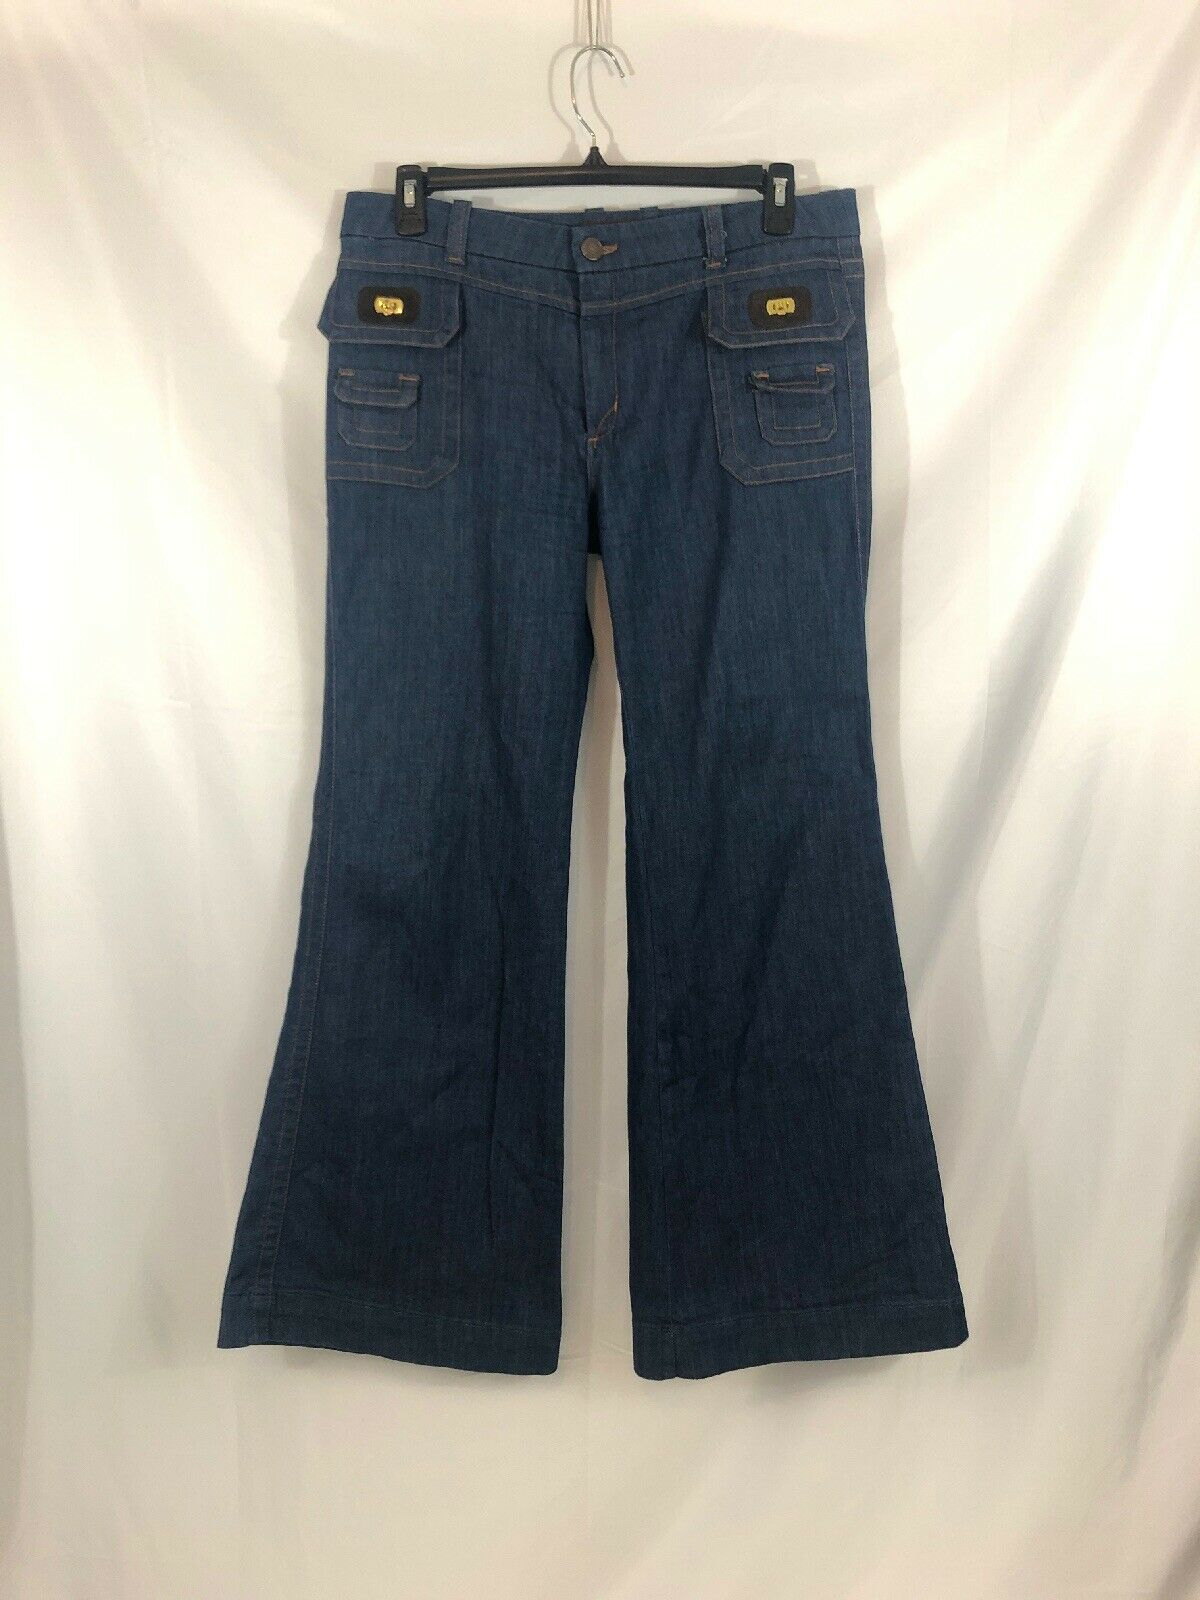 Dittos Womens Size 31 Flare Leg Denim Jeans